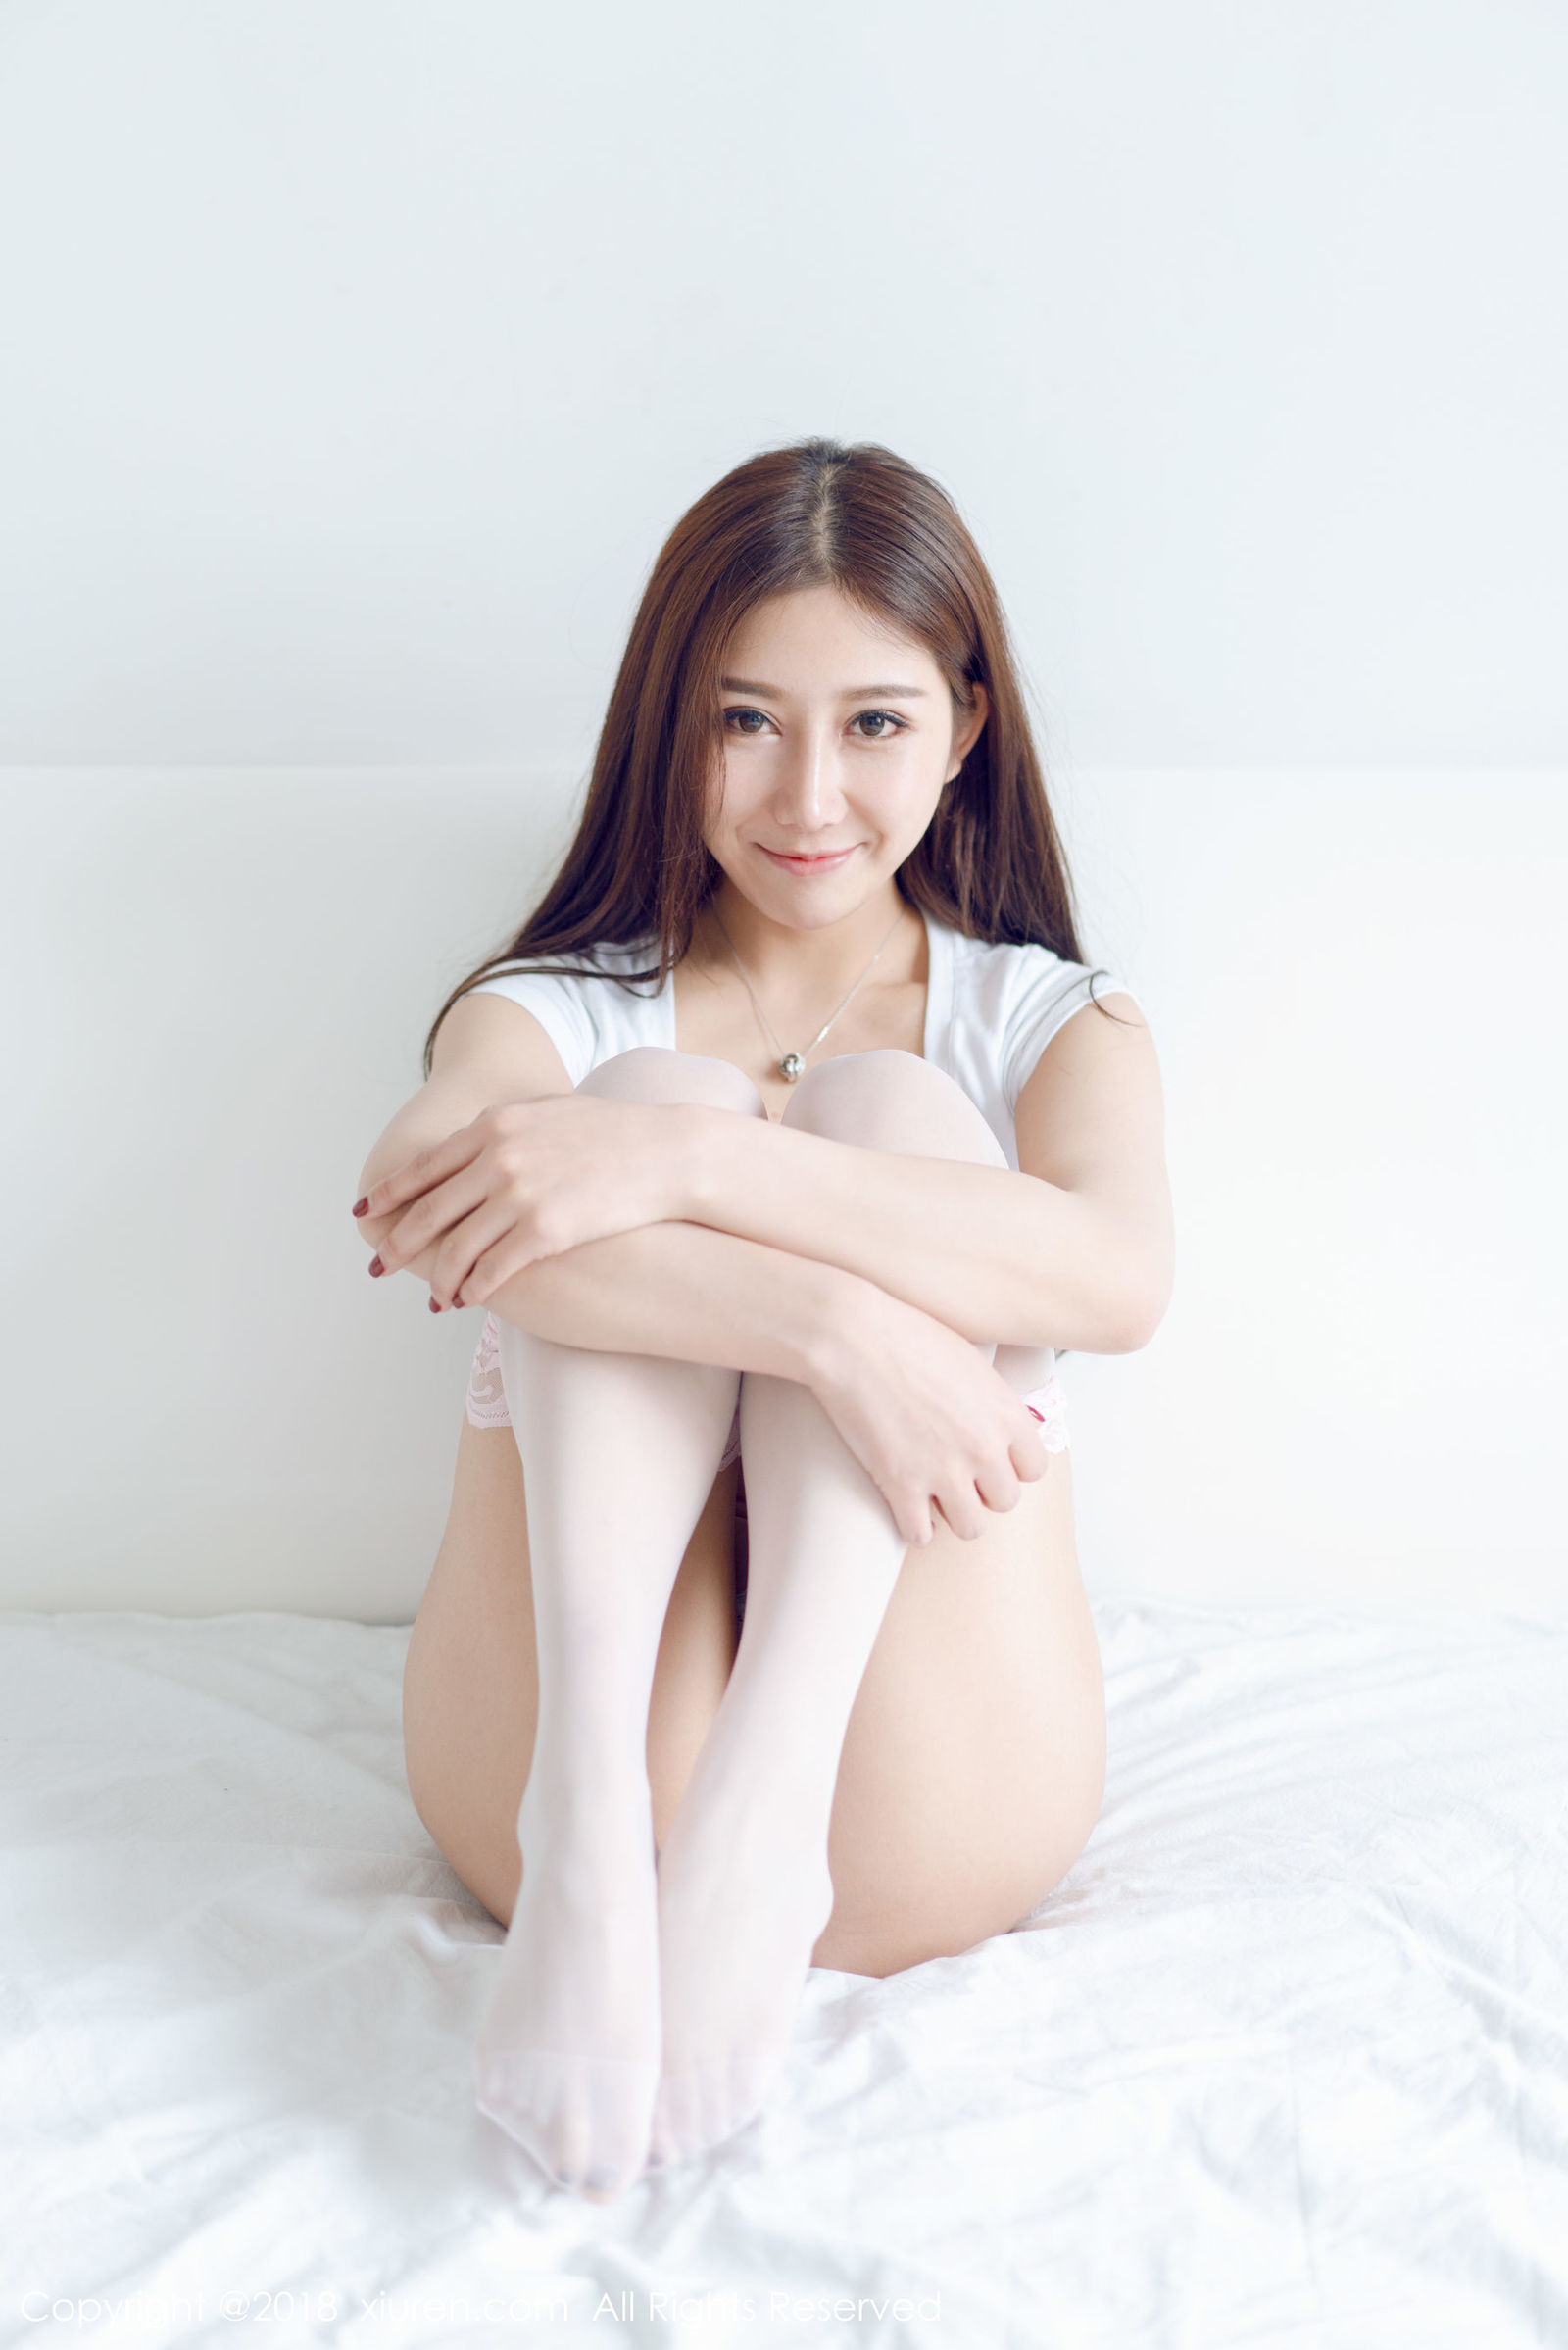 模特@晓梦may 第二套写真